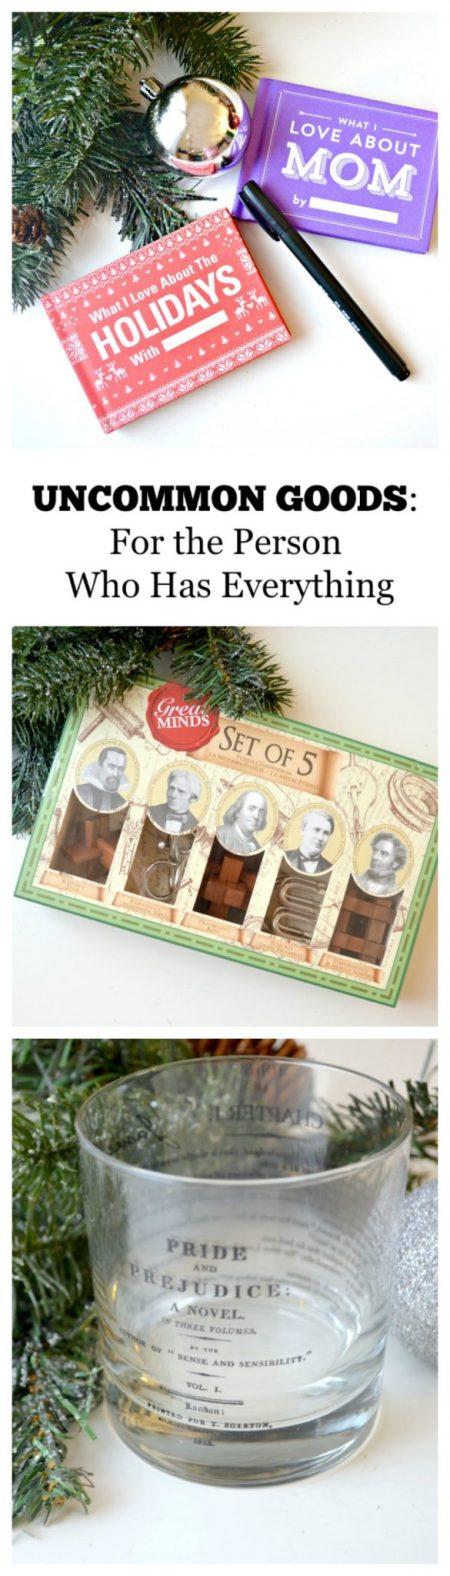 Uncommon Goods Gift Ideas